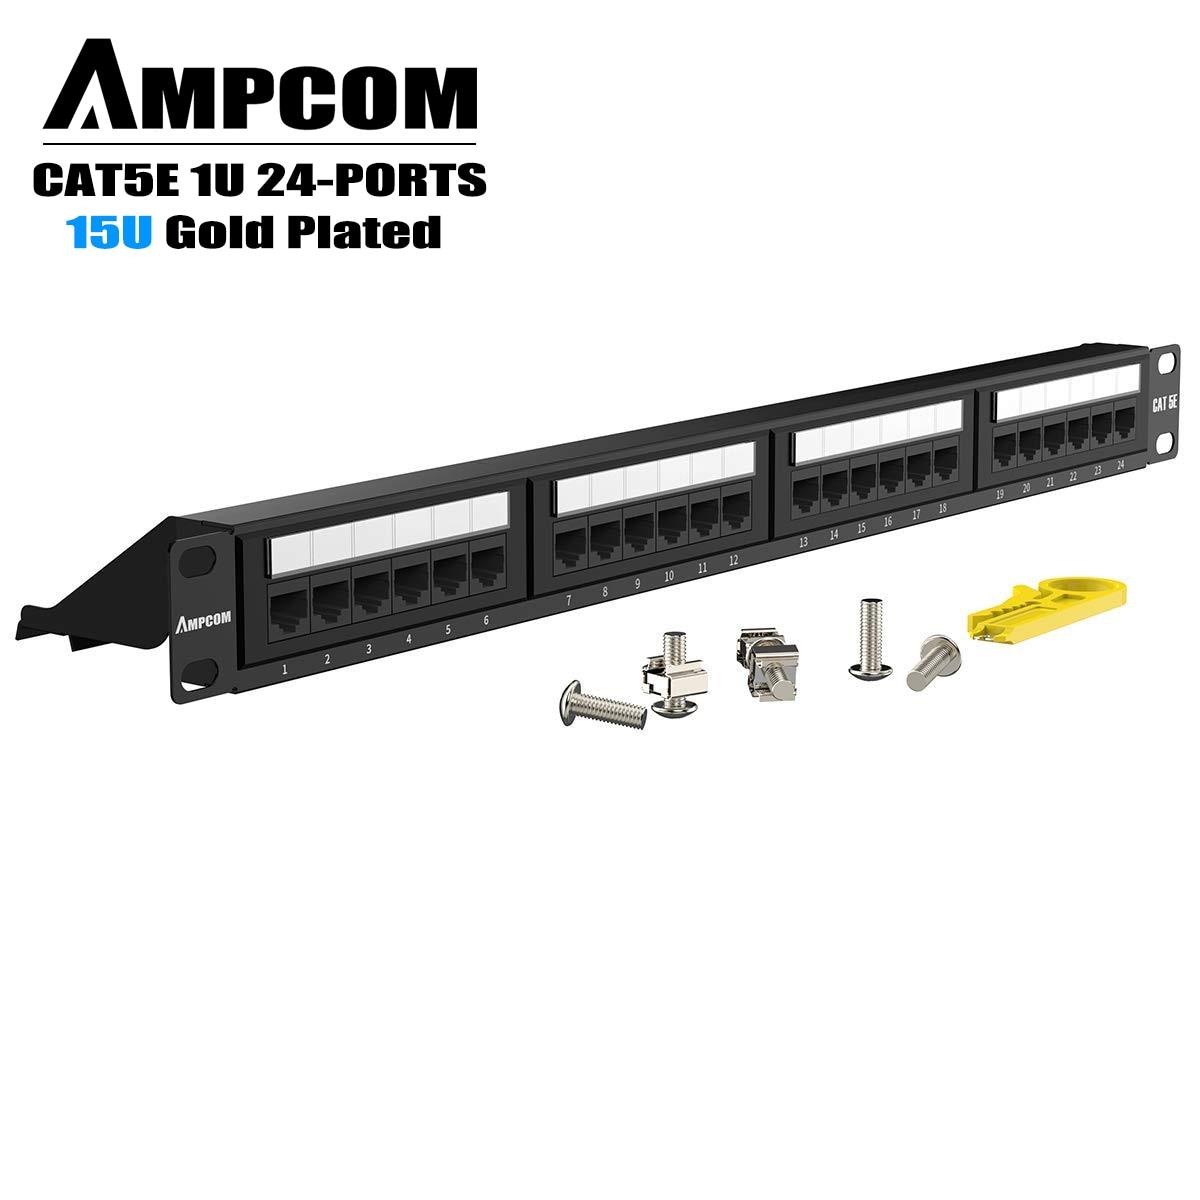 cat5 568a wiring diagram printable ampcom premium series cat5 5e 24 ports patch panel  rack mount 1u  ampcom premium series cat5 5e 24 ports